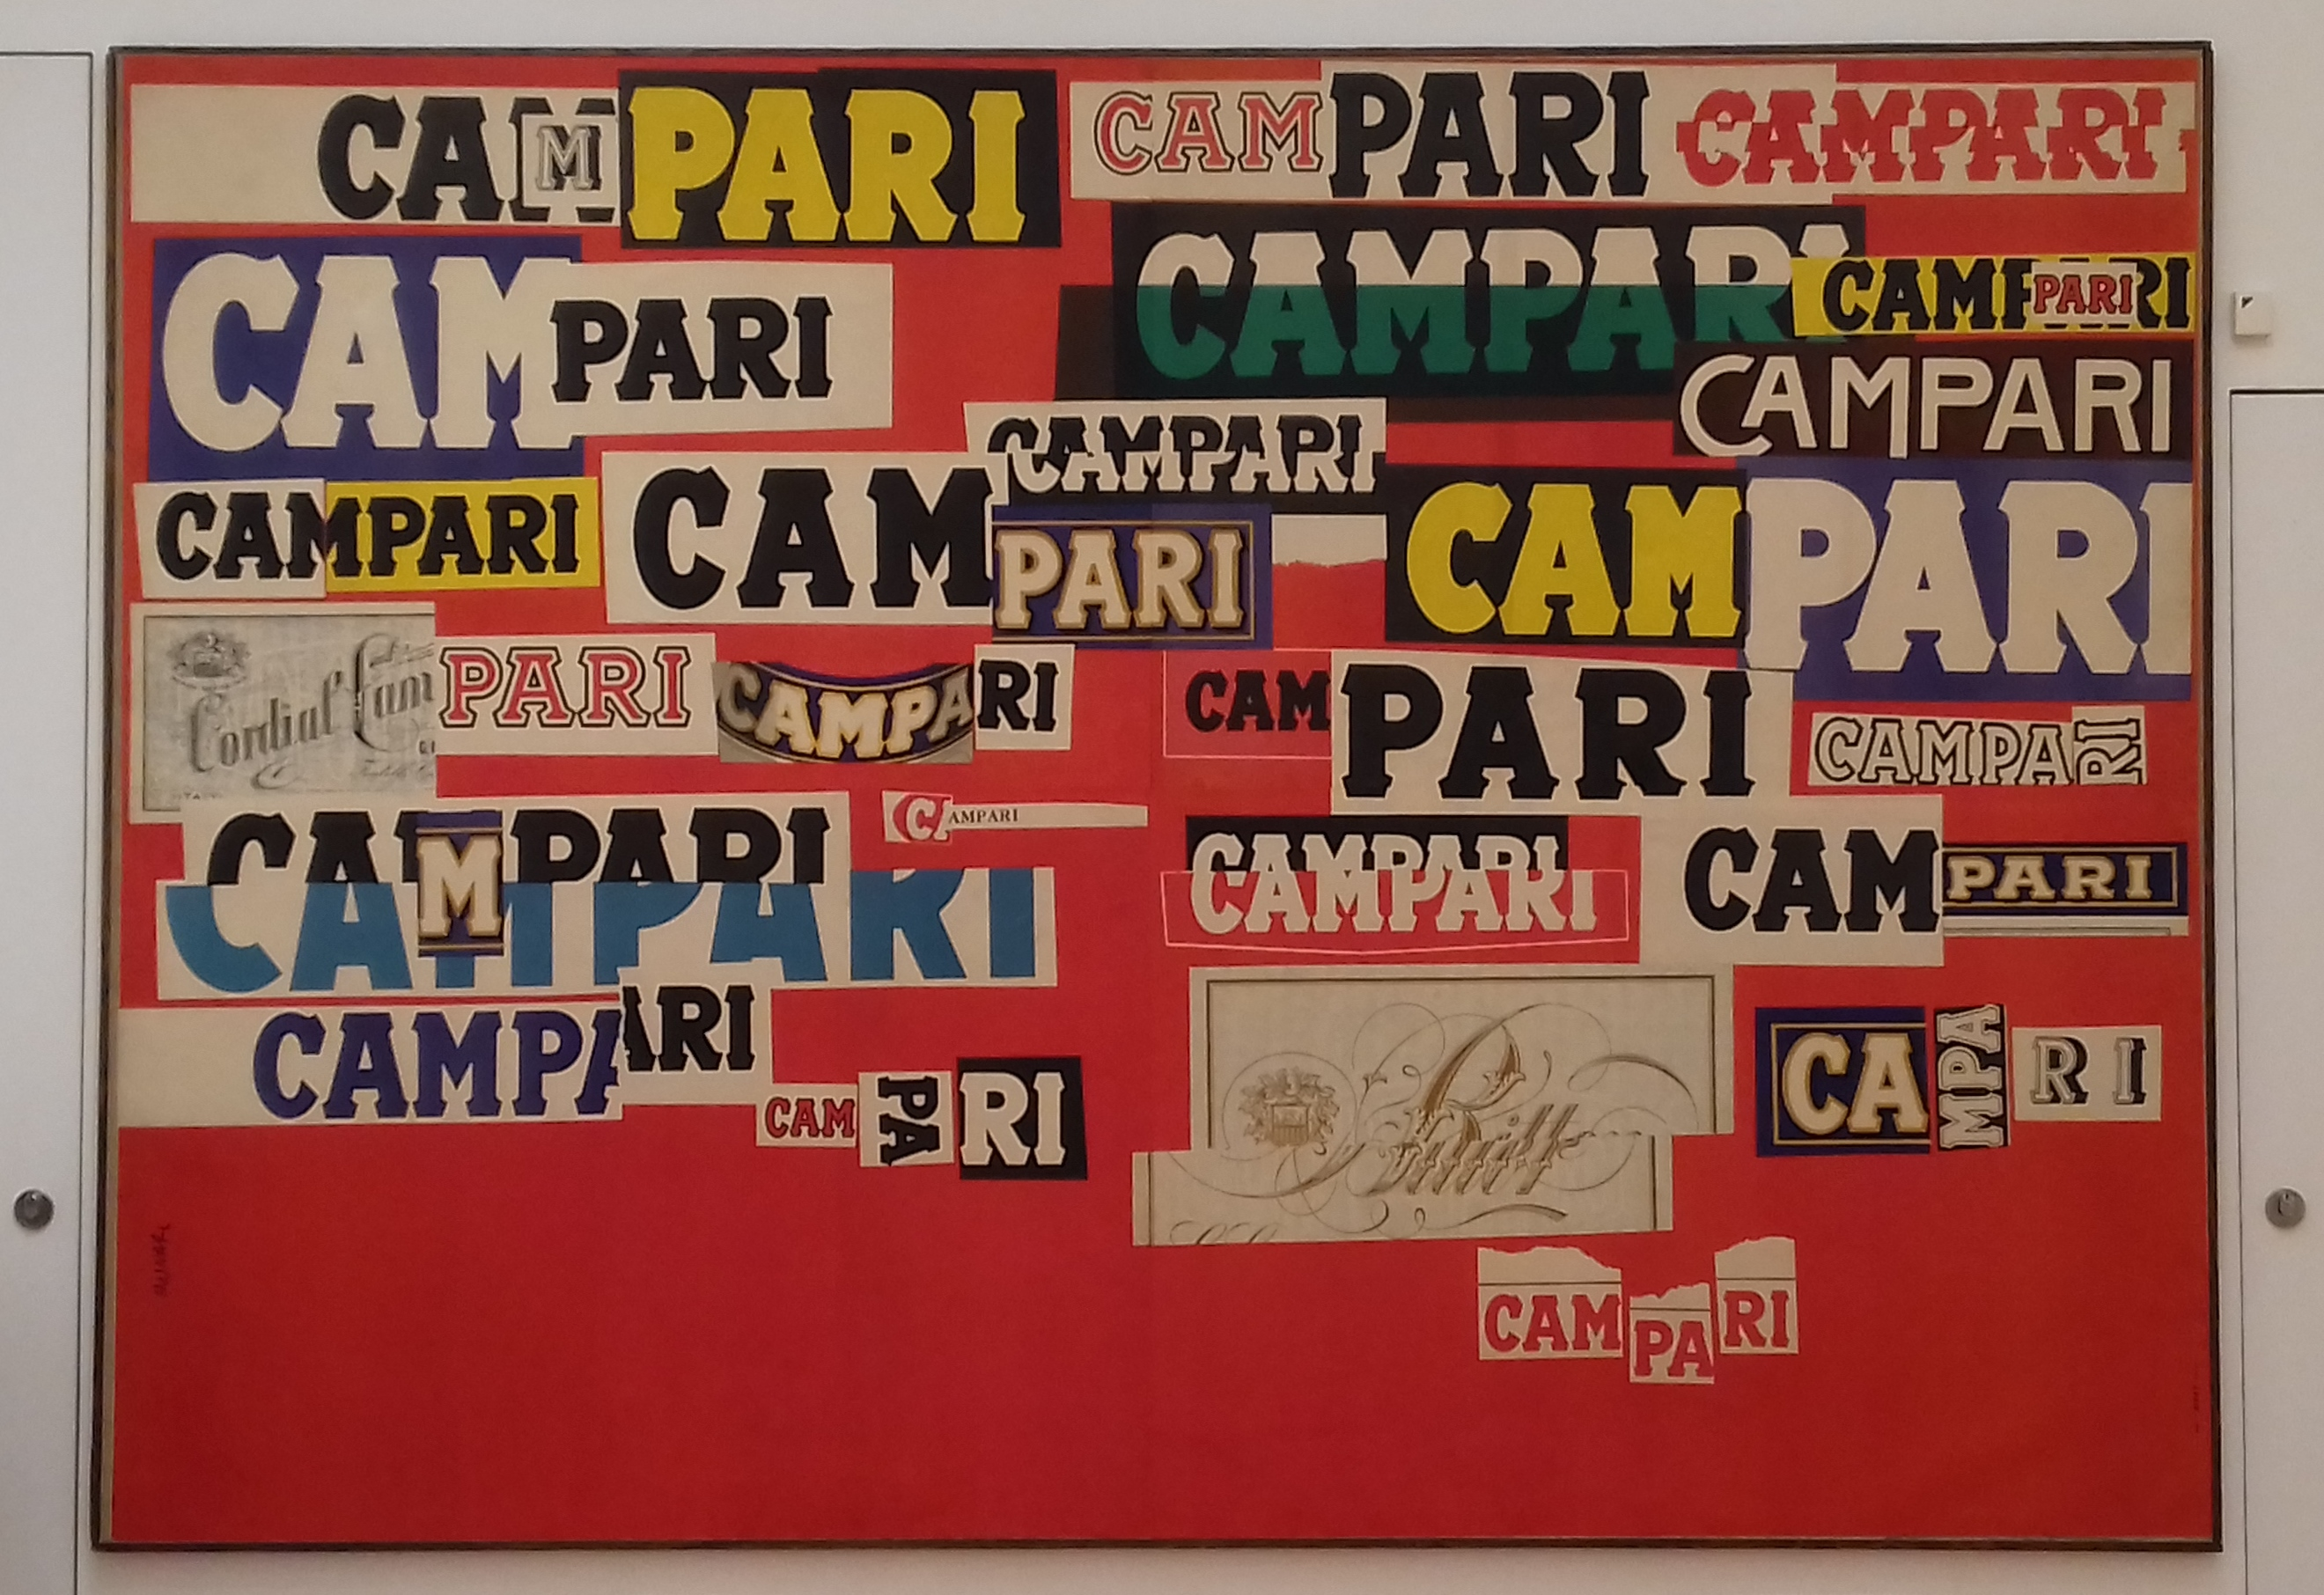 Bruno Munari, Graphic Variation on the Name Campari, 1964. The Art of Campari, Estorick Collection of Modern Italia Art. London 2018 © Paola Cacciari